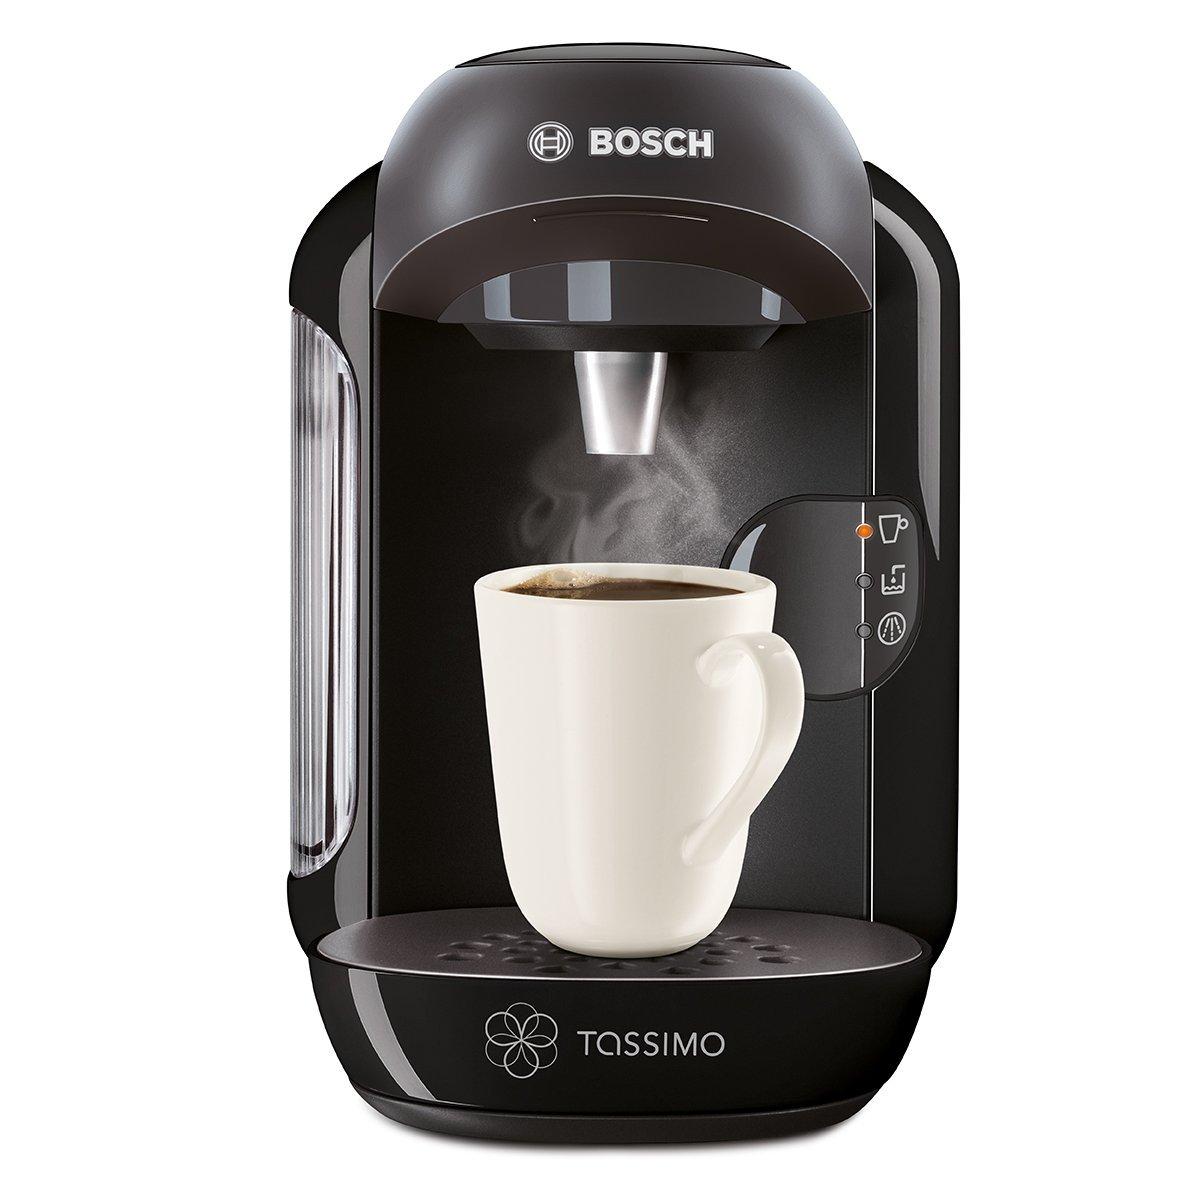 Bosch-TAS1252-Tassimo-Multi-Getränke-Automat-VIVY5 Tassimo VIVY